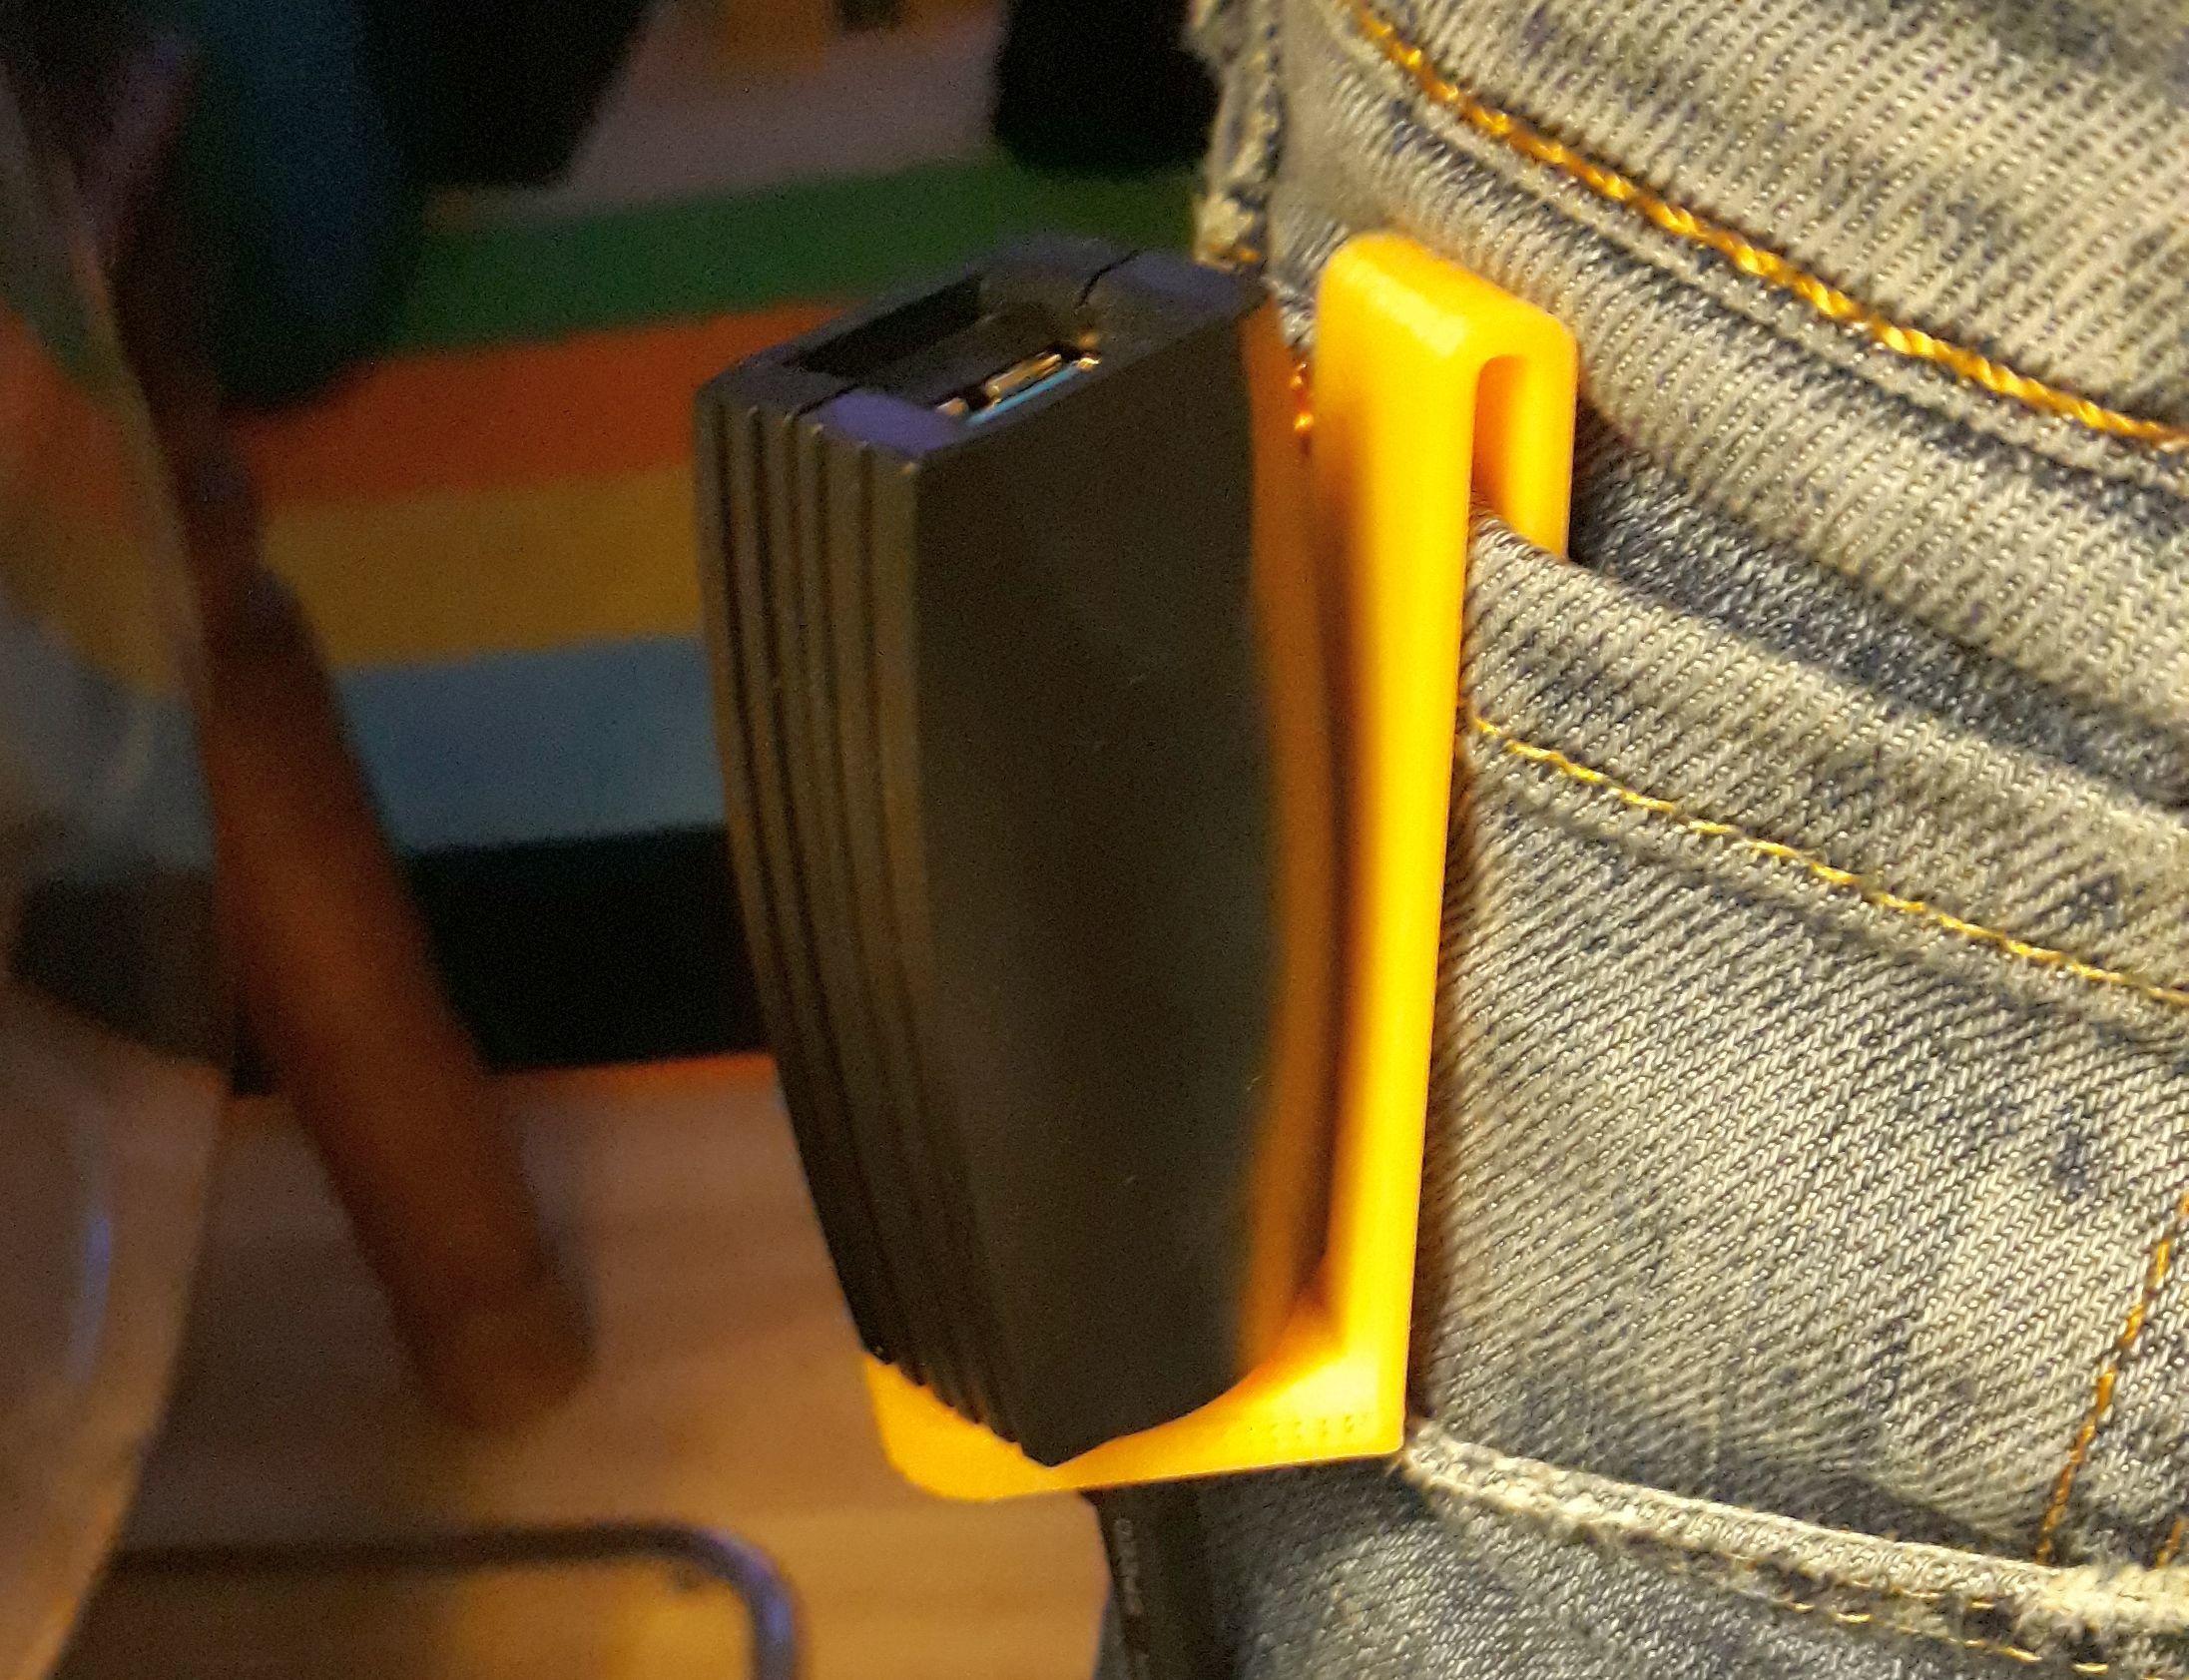 usbclip.jpg Download free STL file (Oculus Quest) USB extension cable belt clip • 3D printer template, sui77